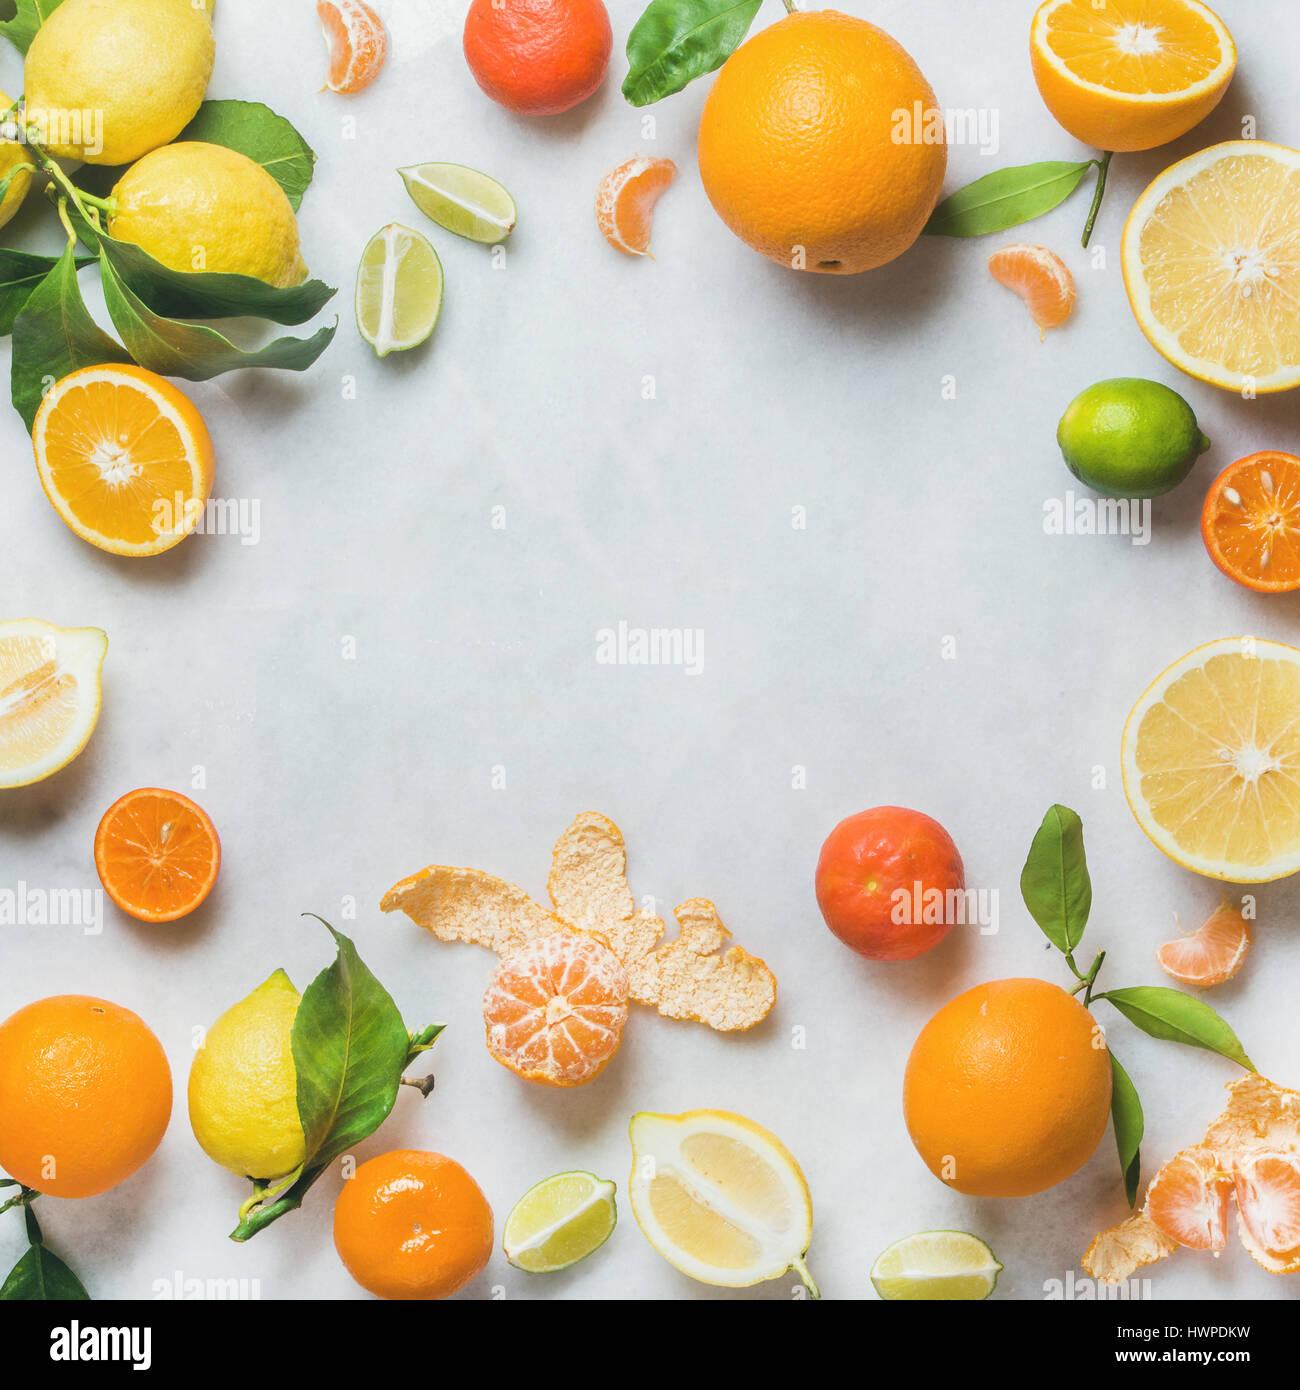 Varietà di agrumi freschi per la produzione di succhi di frutta o frullati Immagini Stock